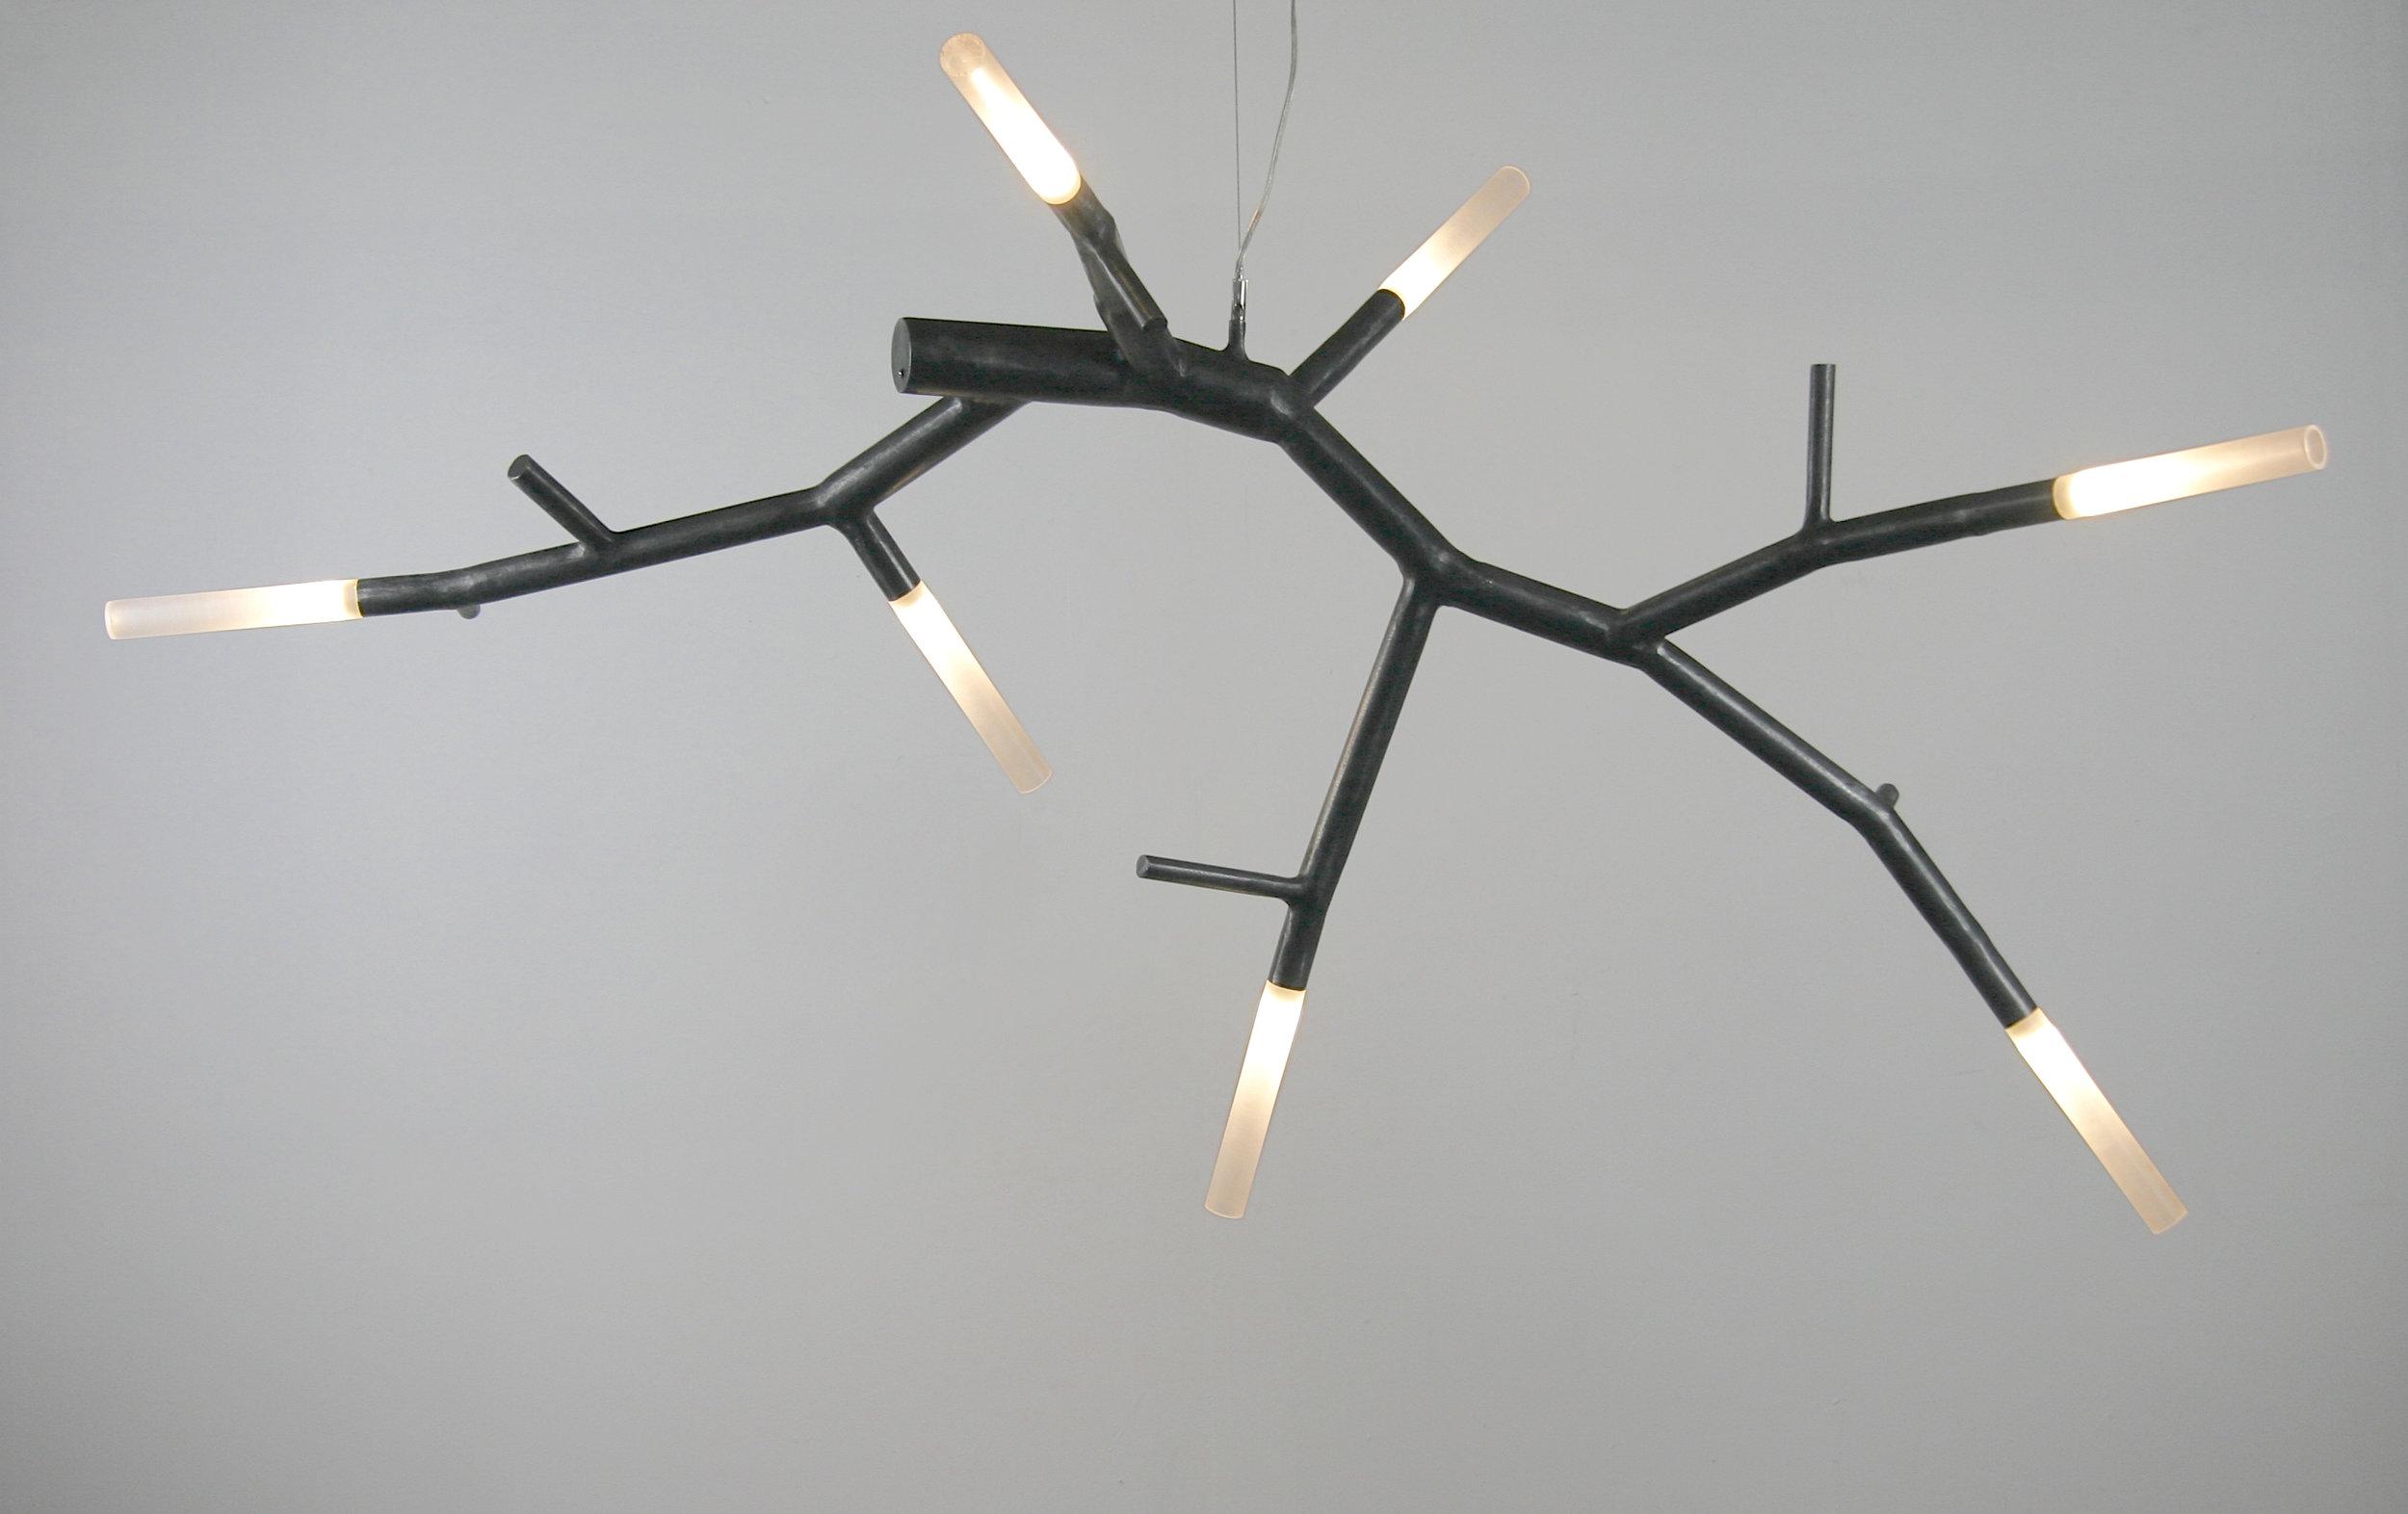 newGROWTH2 floating LED chandelier